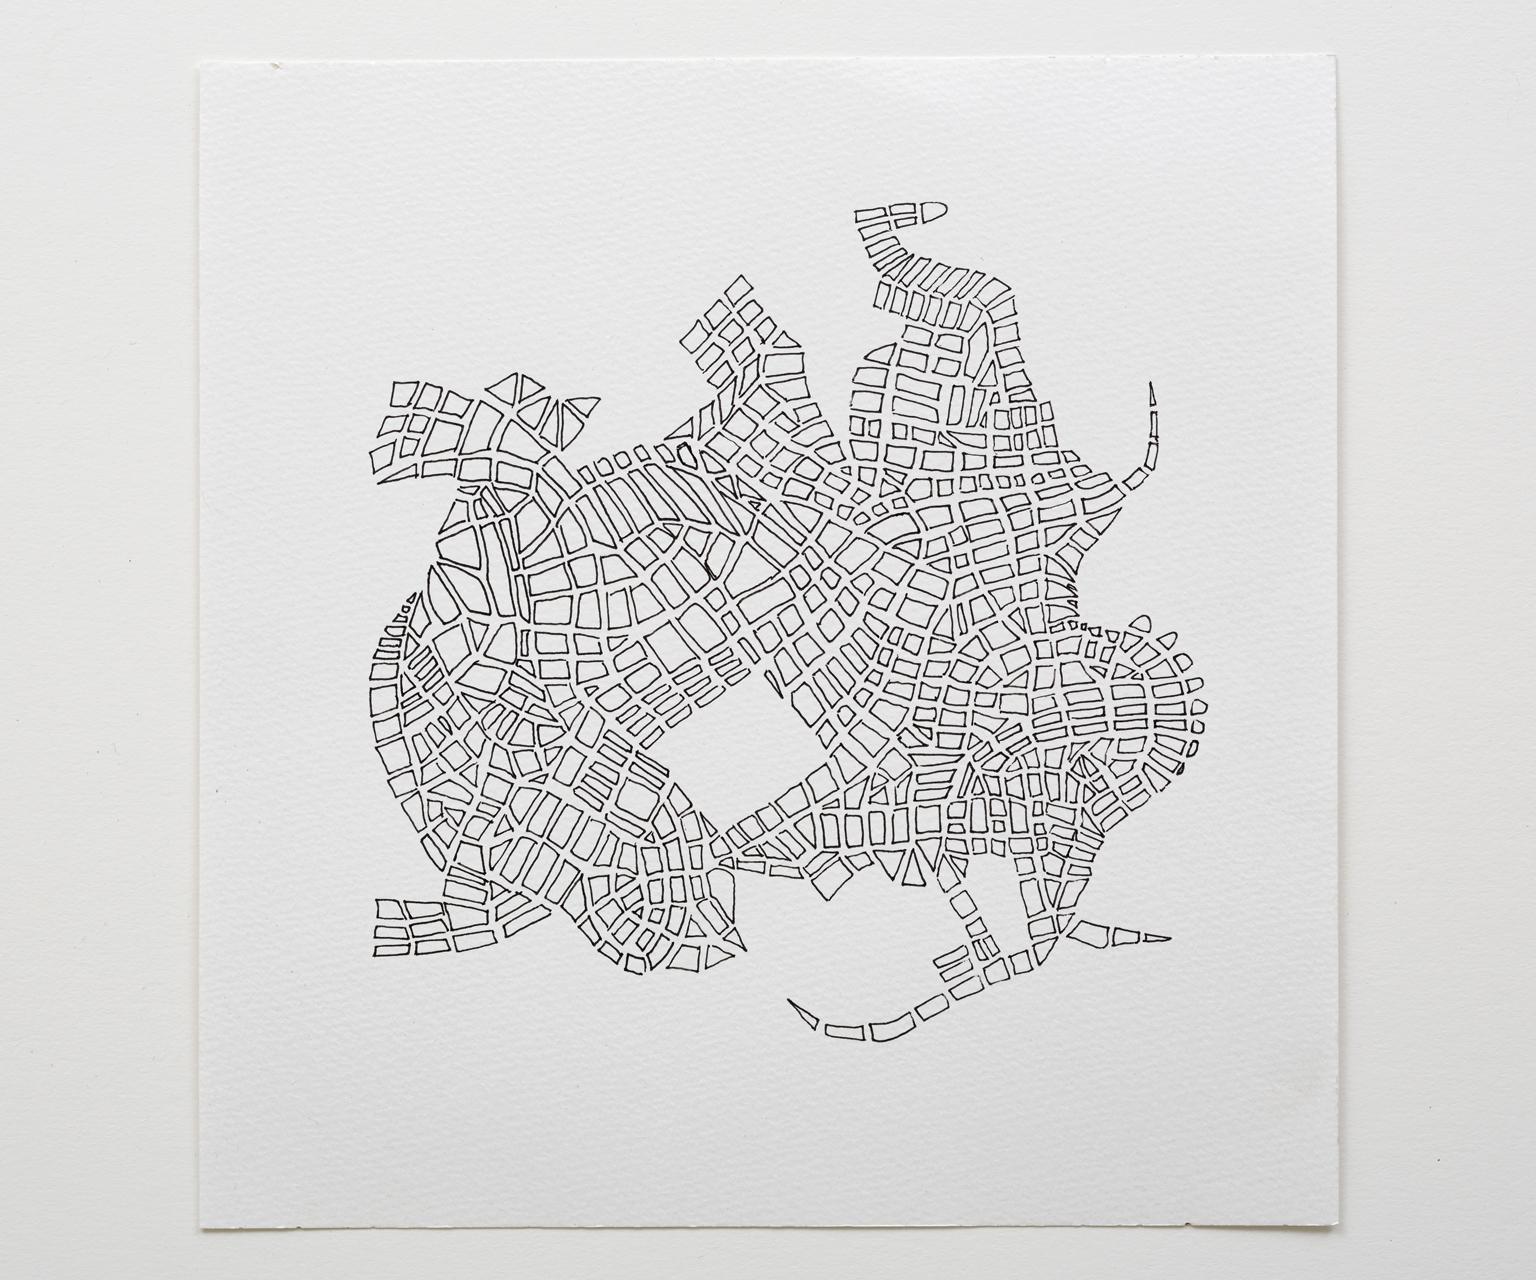 Untitled No. 1, 2011